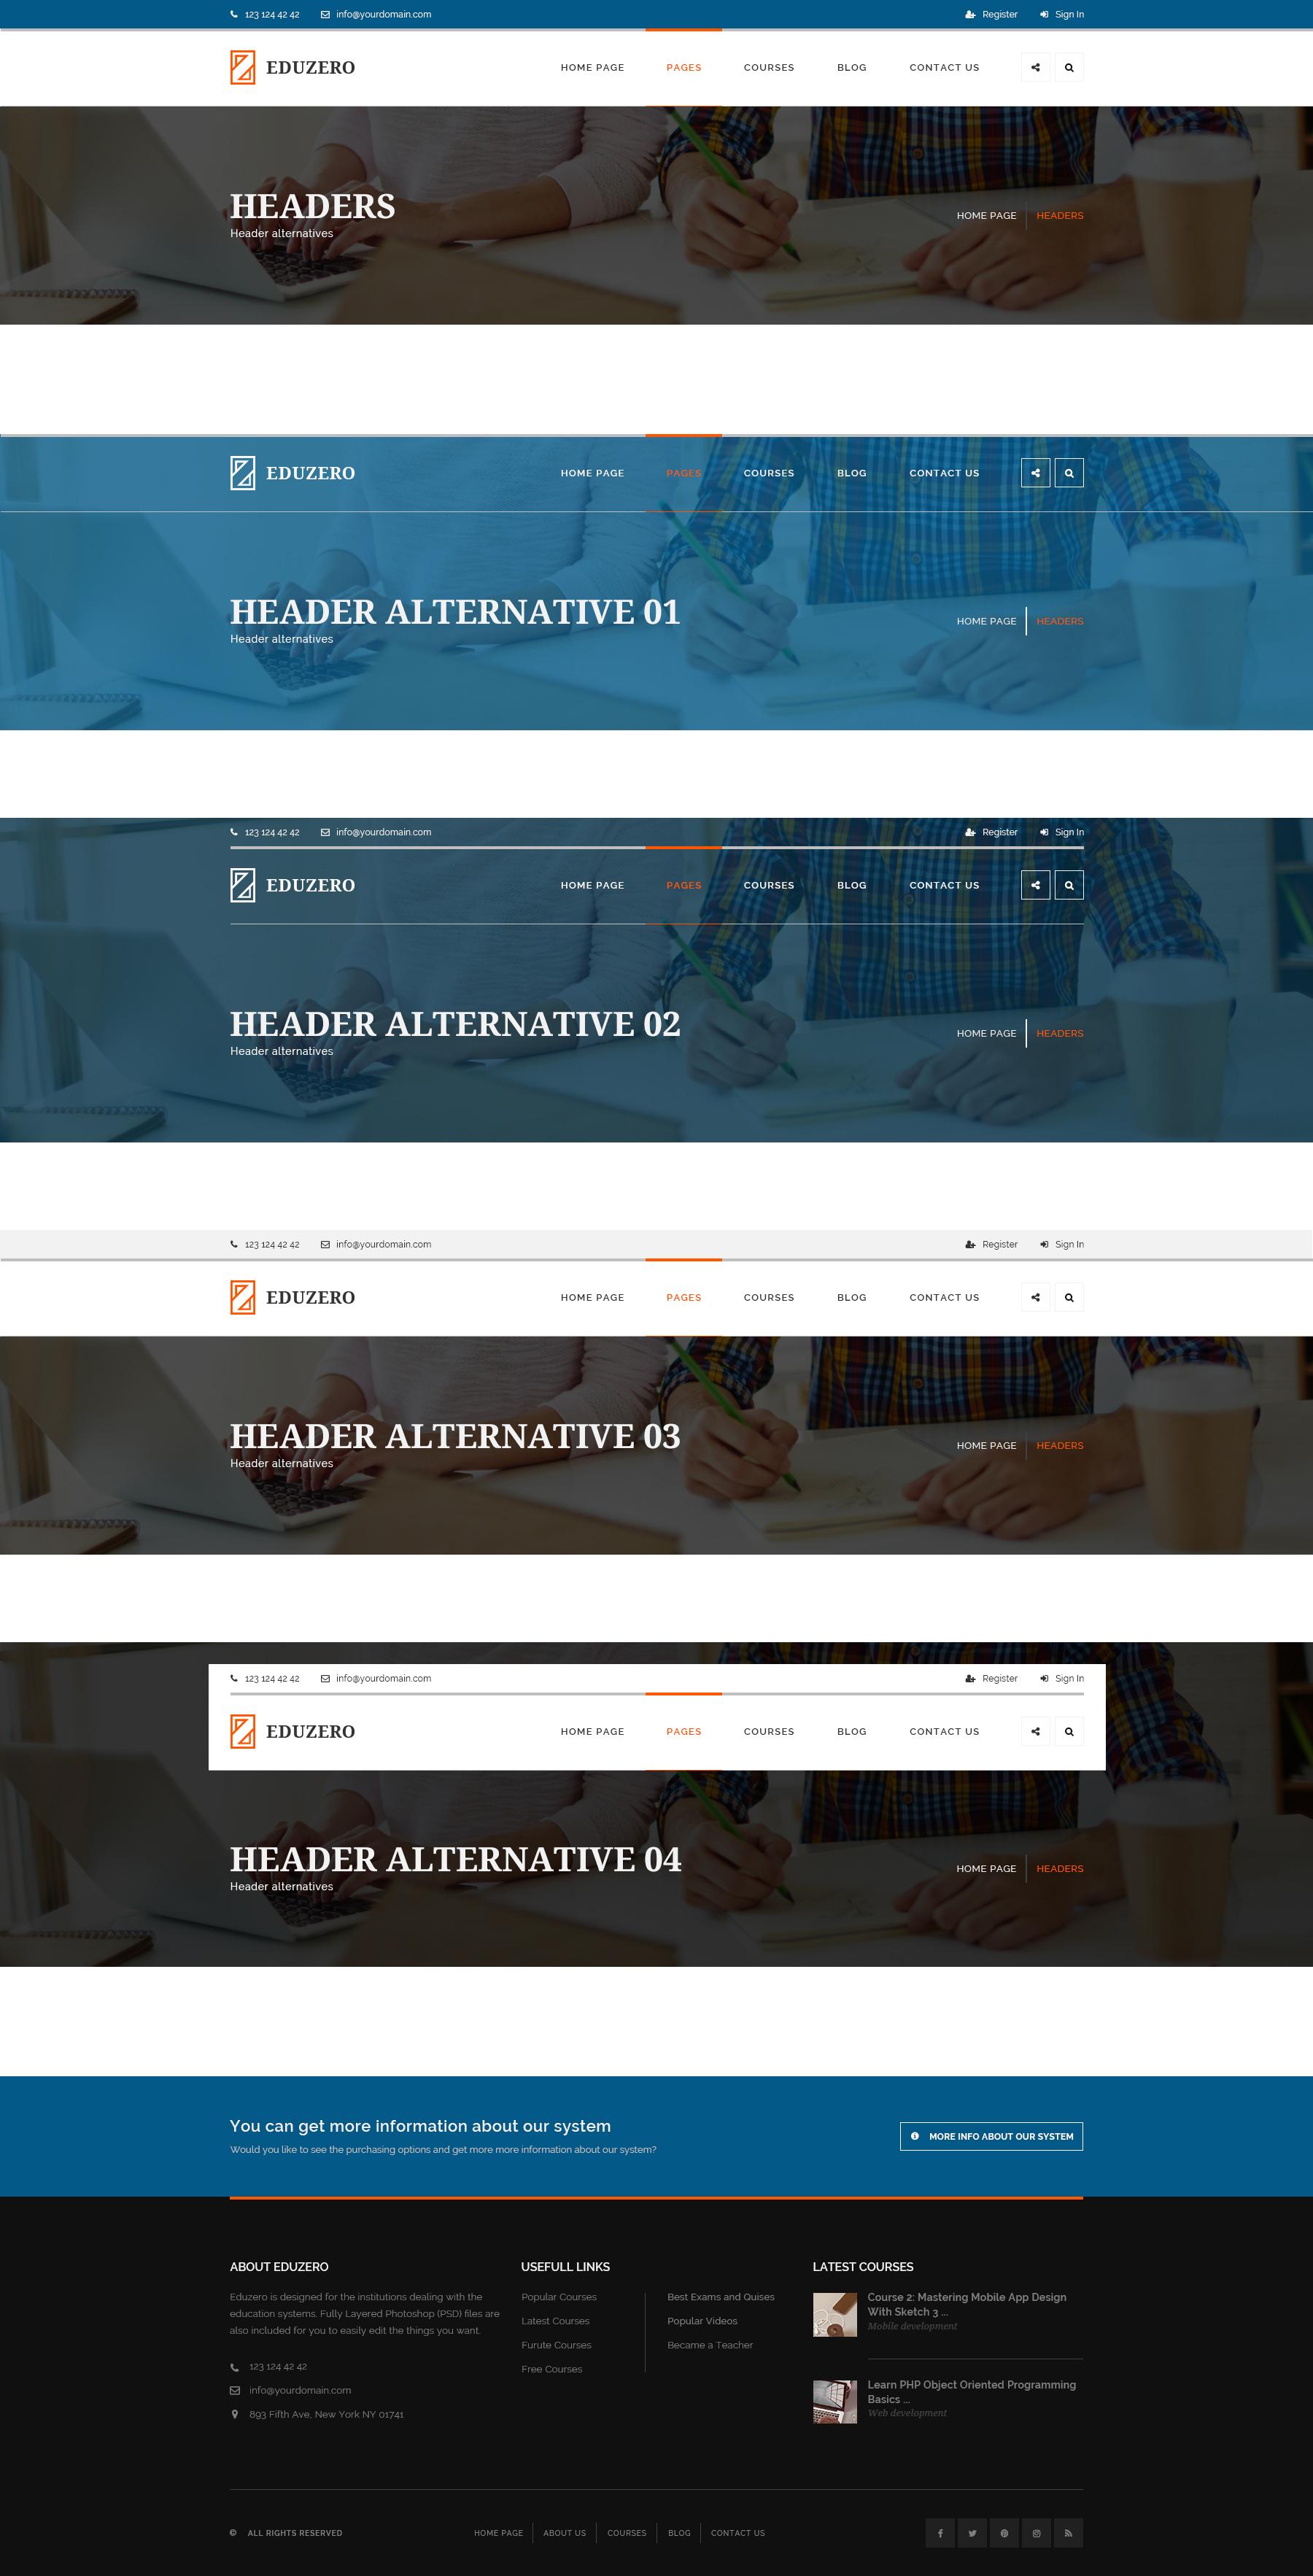 EDUZERO - Education PSD Template by raera | ThemeForest